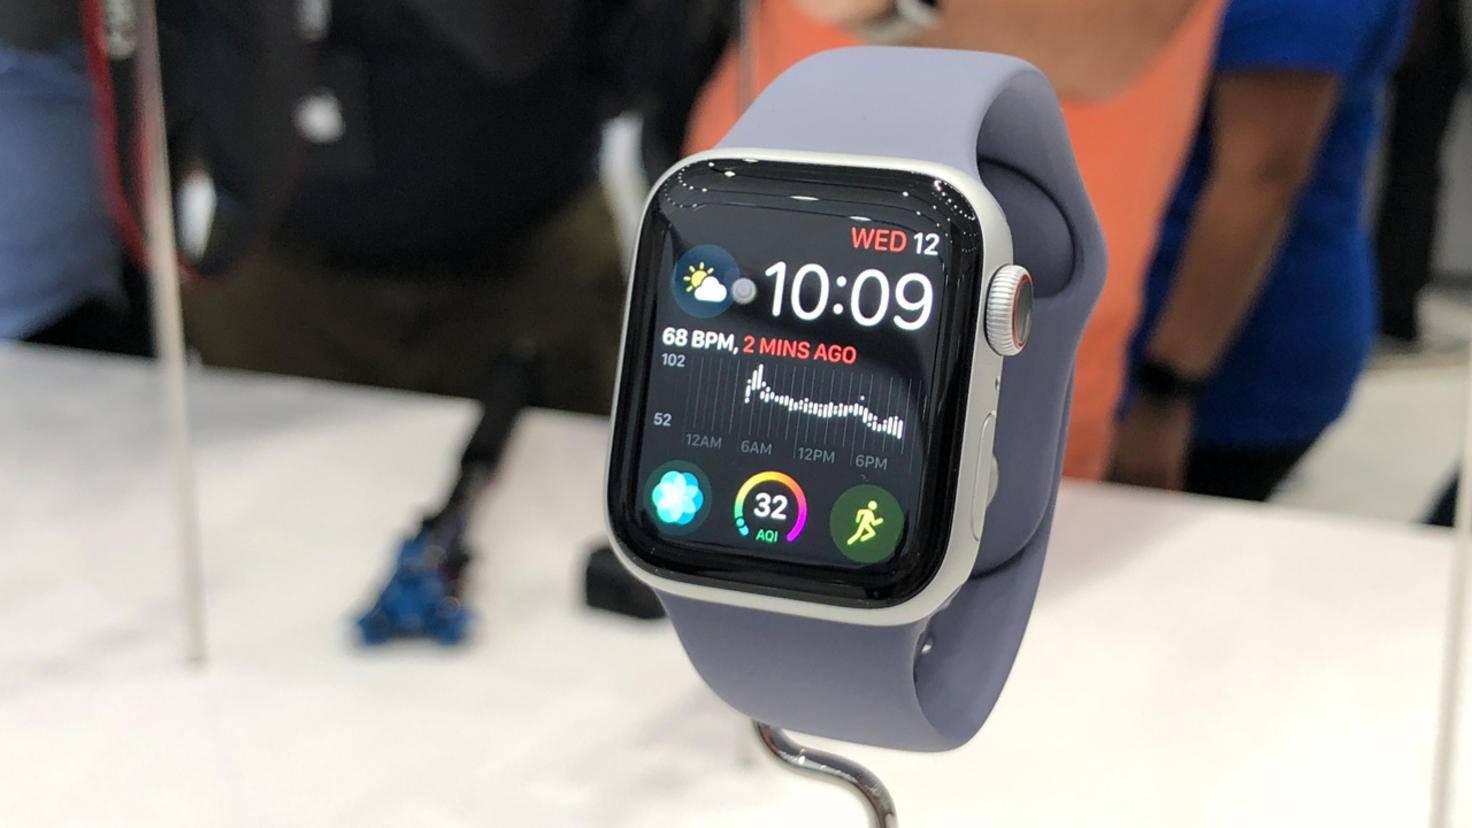 Apple Watch Series 4